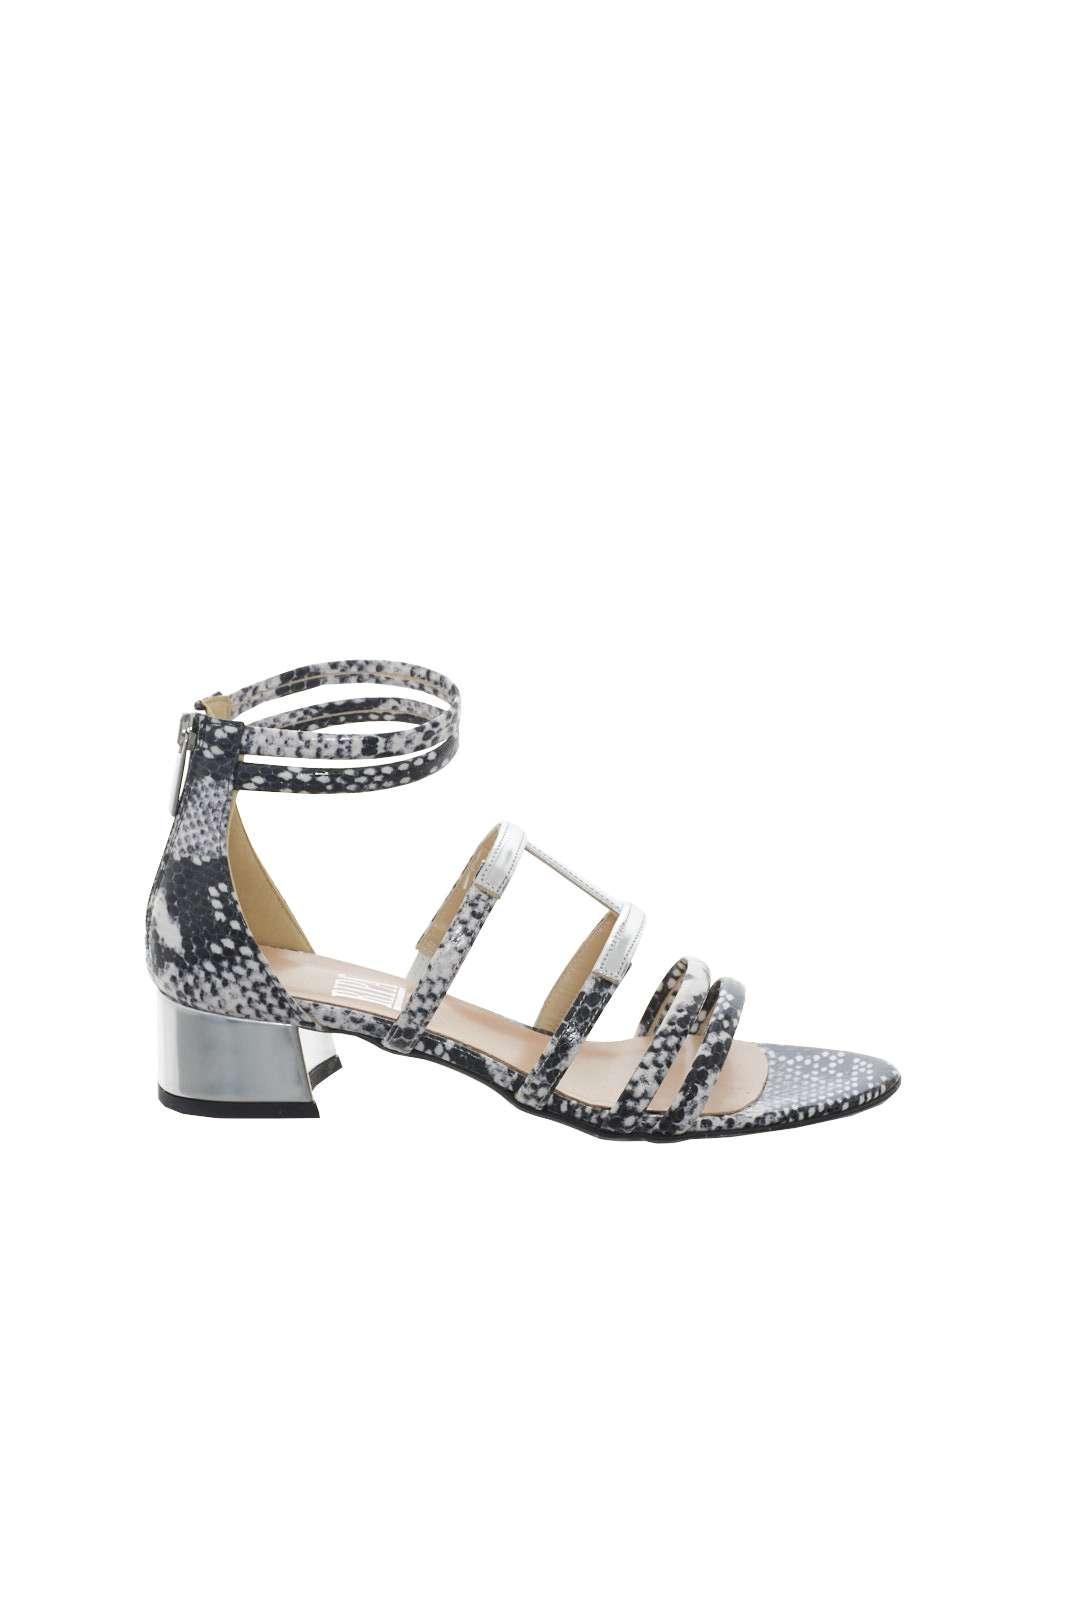 https://www.parmax.com/media/catalog/product/a/i/PE-outlet_parmax-sandali-donna-Ripa-Shoes-ripa-A.jpg